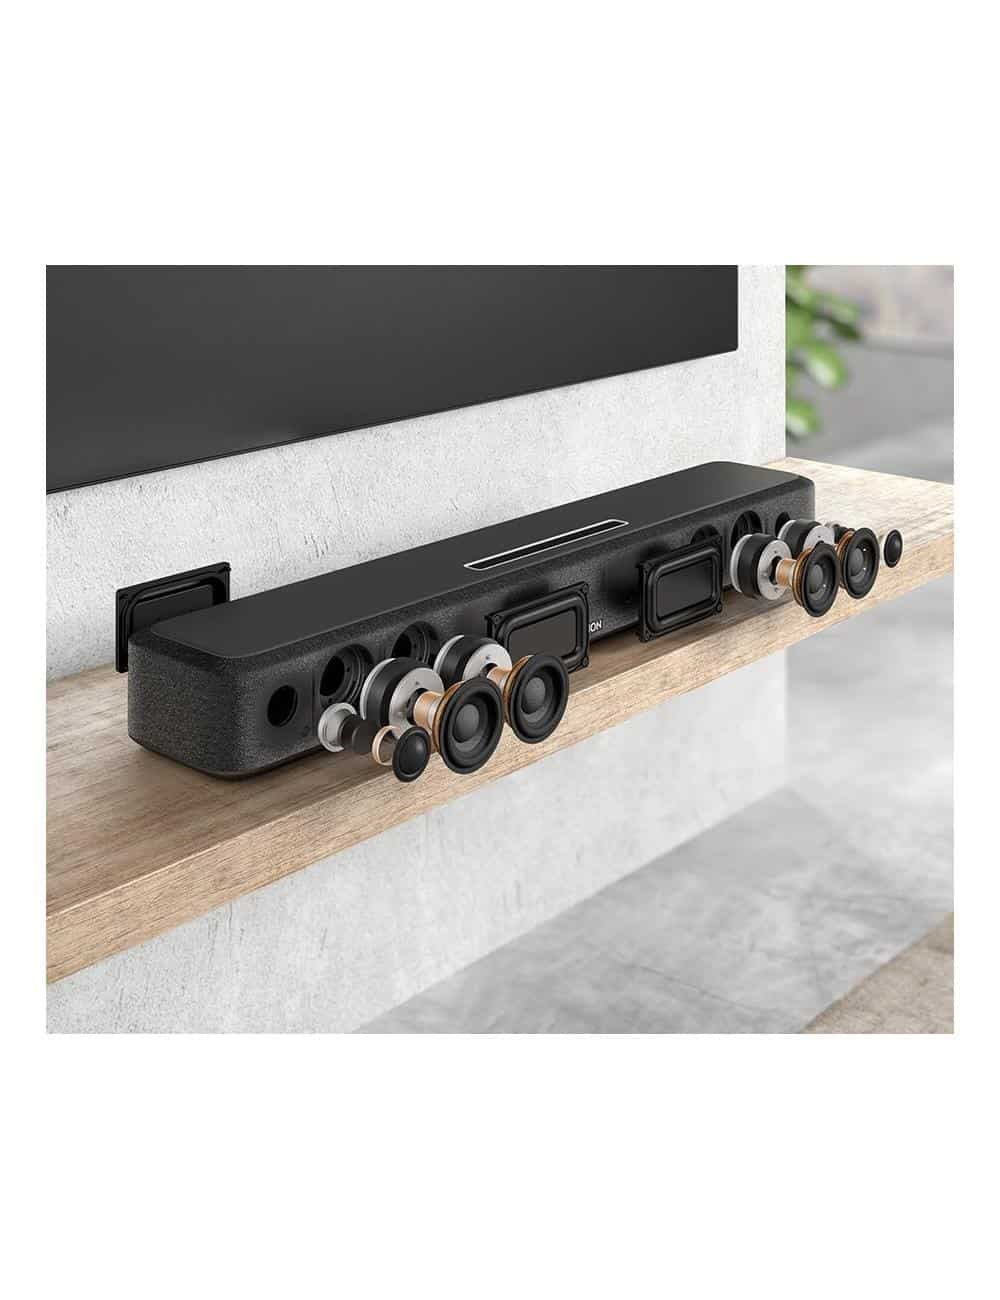 soundbar wireless super compatta, Denon Home Sound Bar 550, Dolby ATMOS e DTS: X, Heos, Bluetooth, costruzione